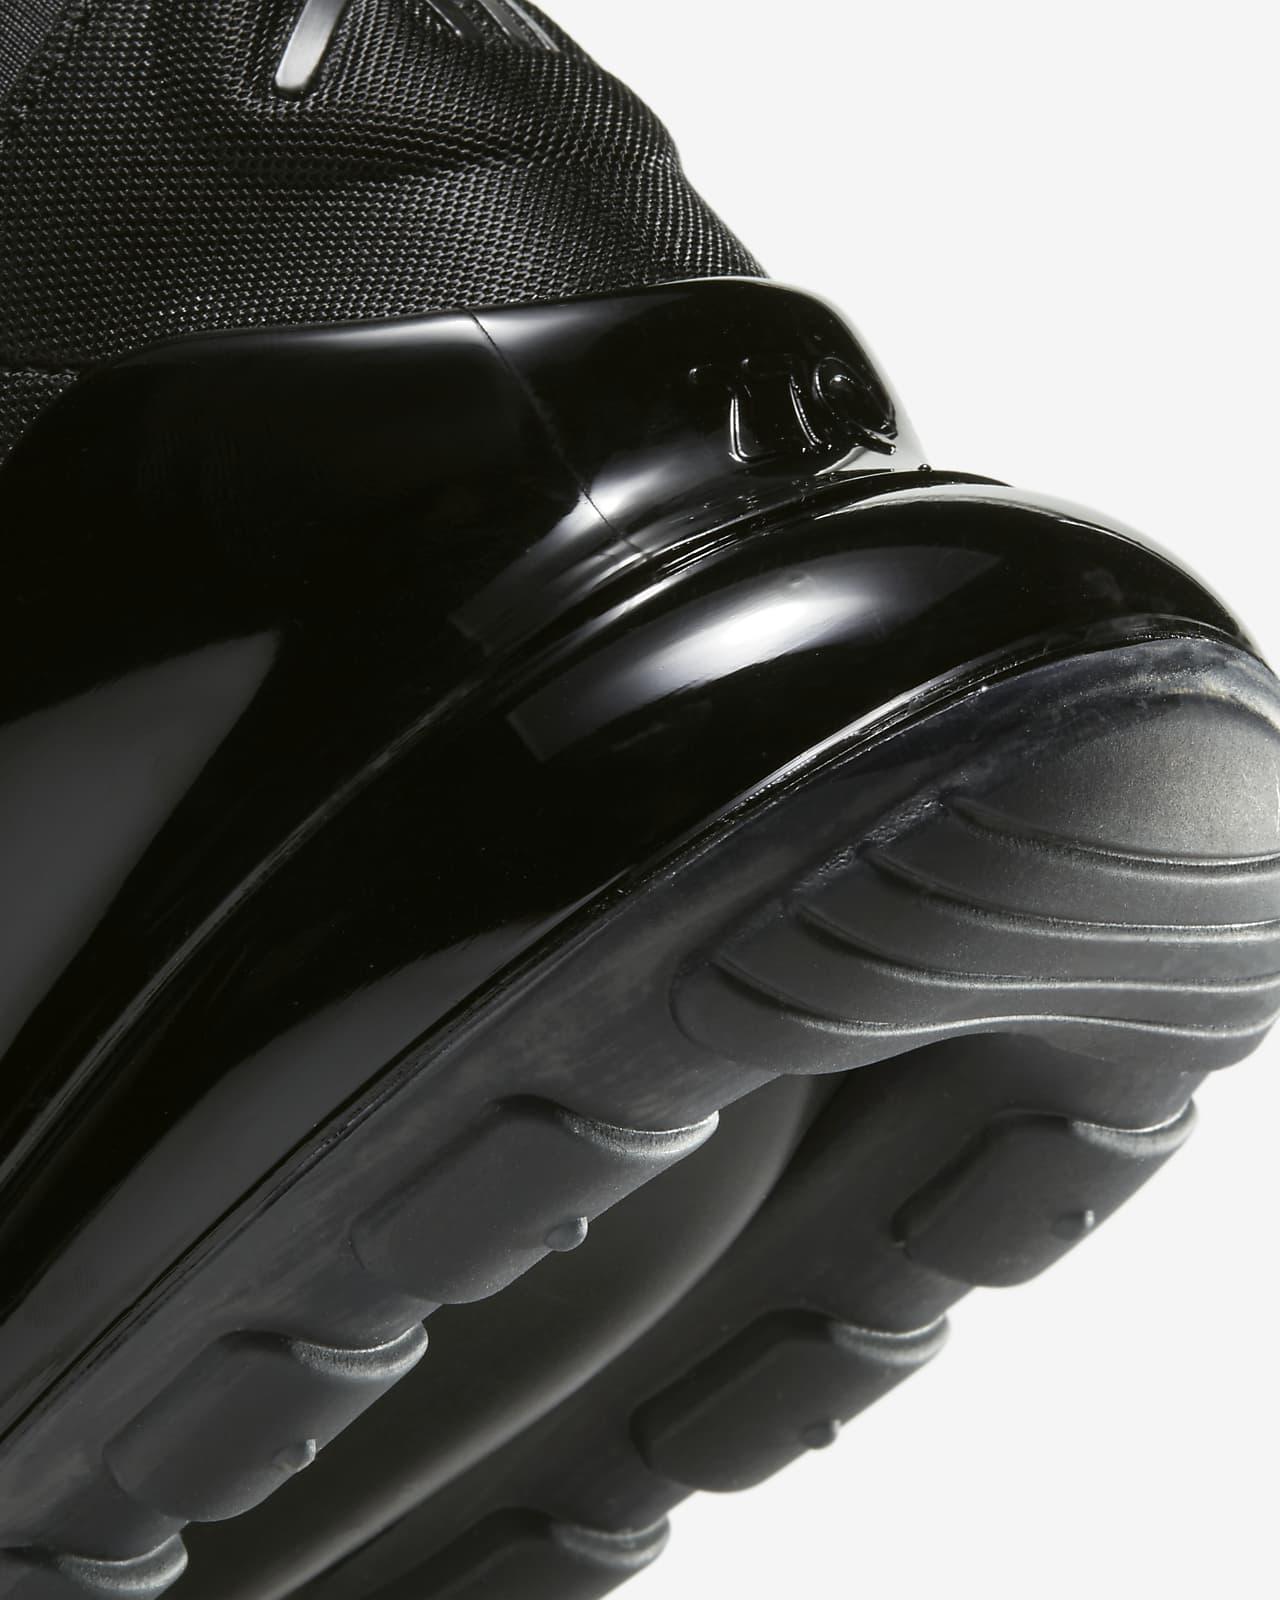 Importancia defensa ella es  Calzado para hombre Nike Air Max 270. Nike MX